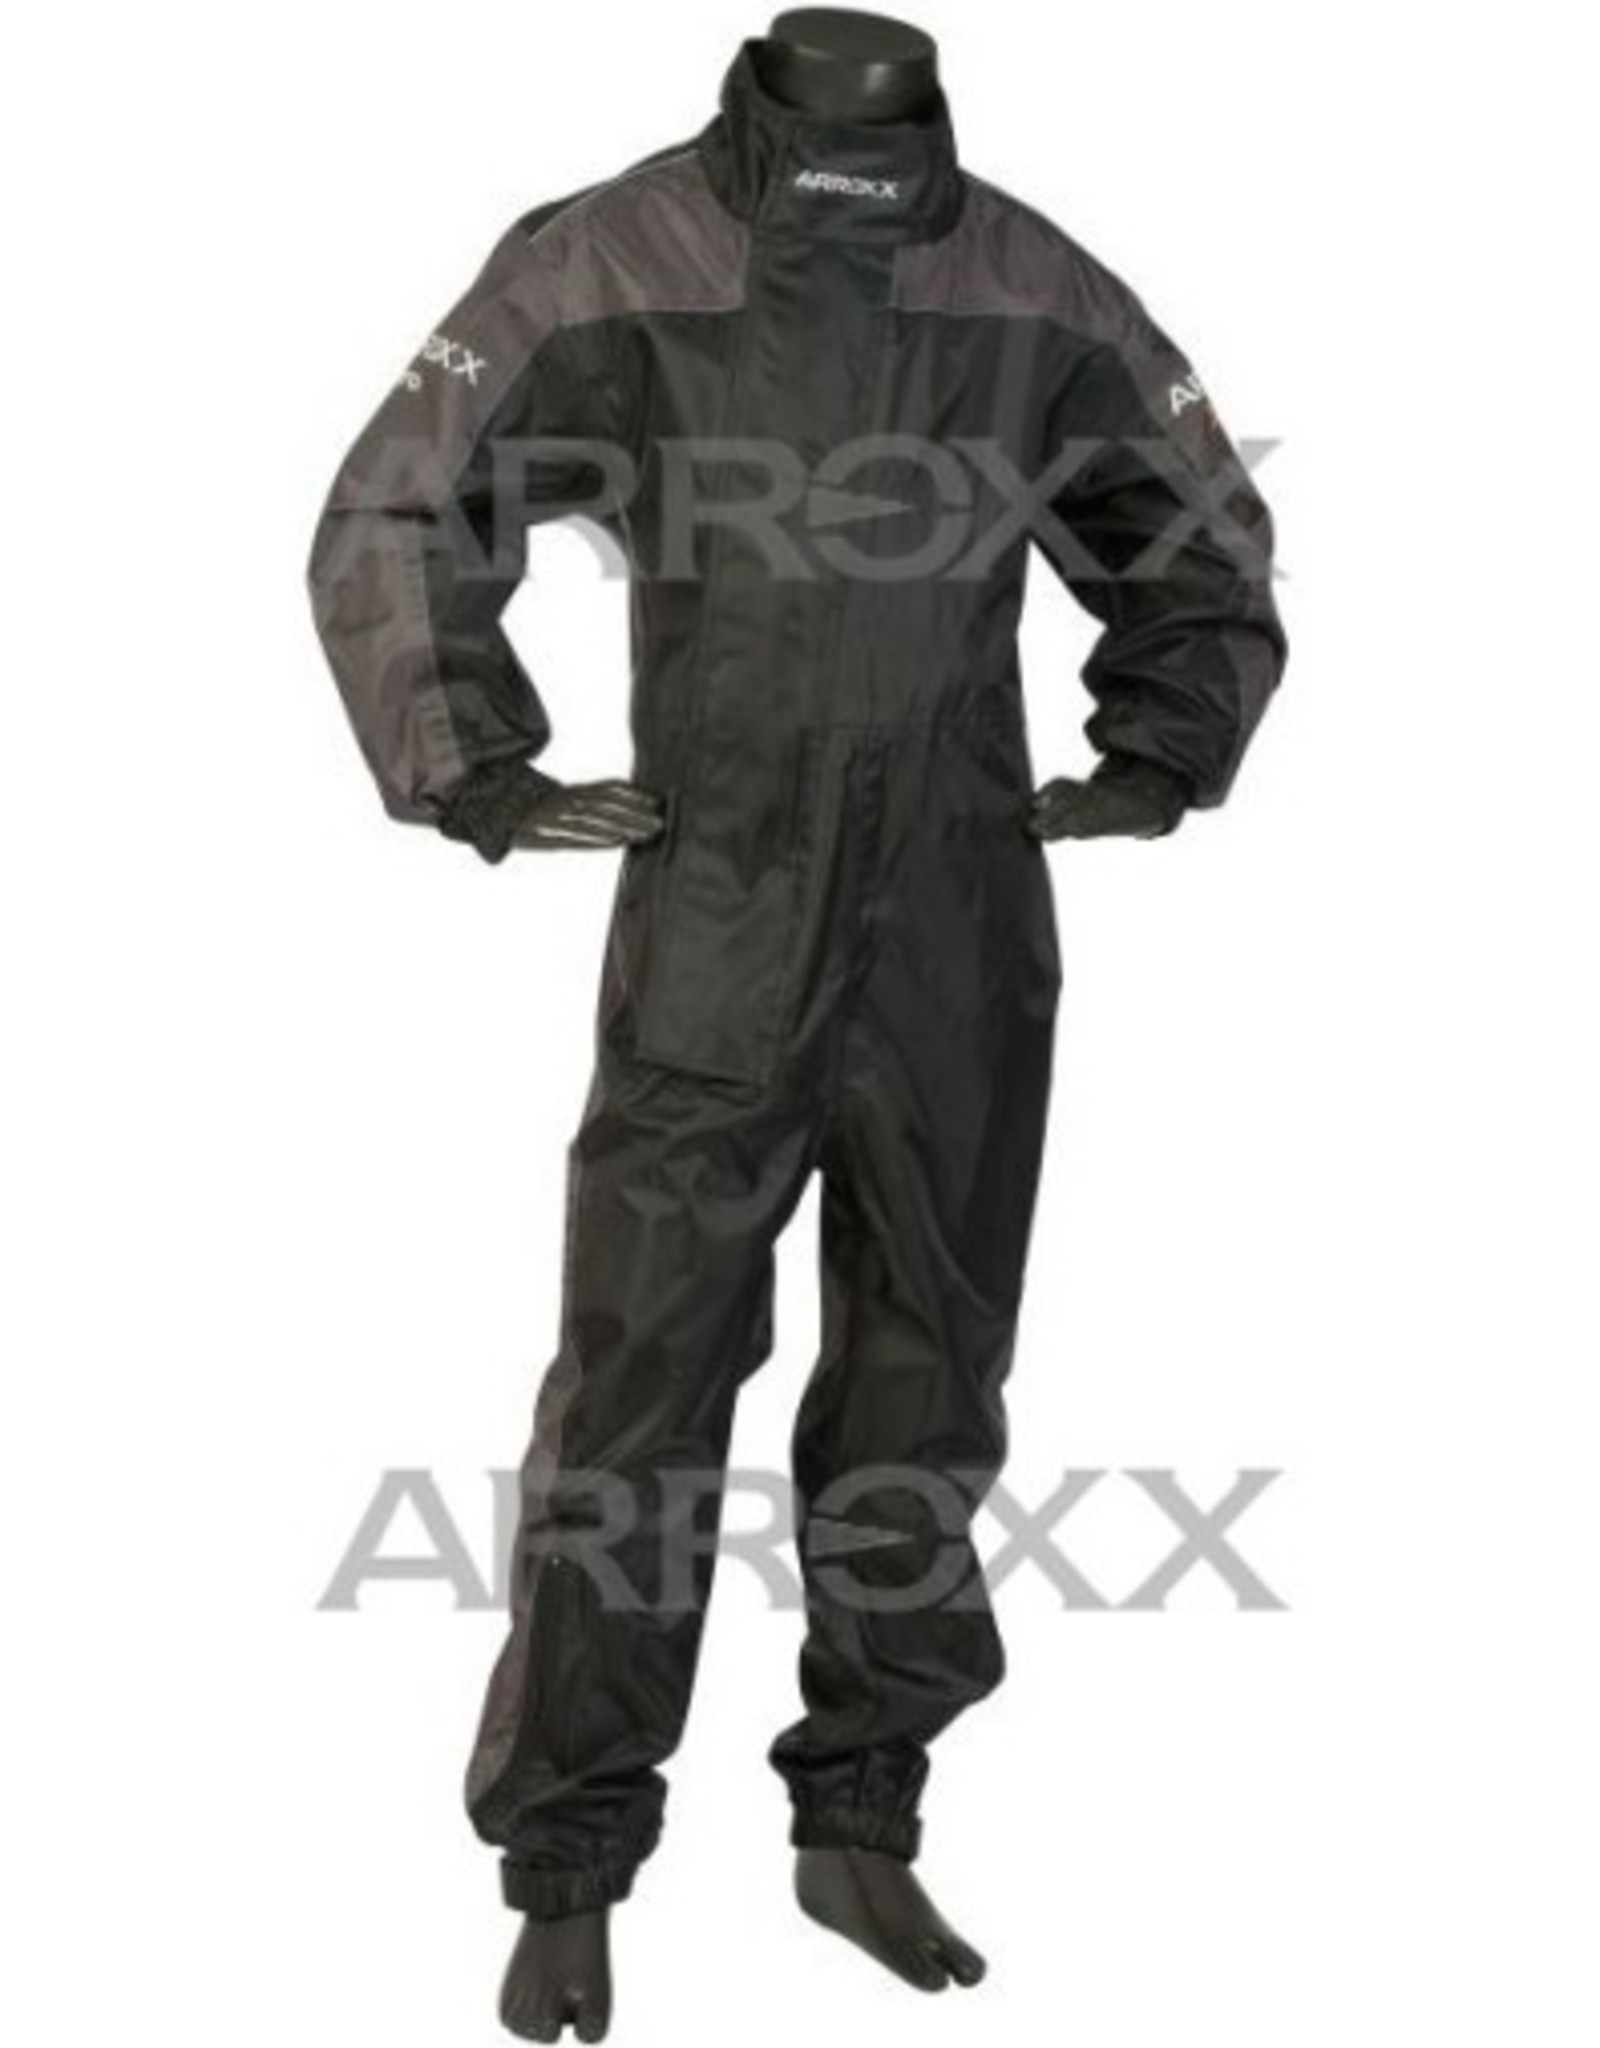 Arroxx Arroxx regenoverall Xpro Junior zwart / grijs